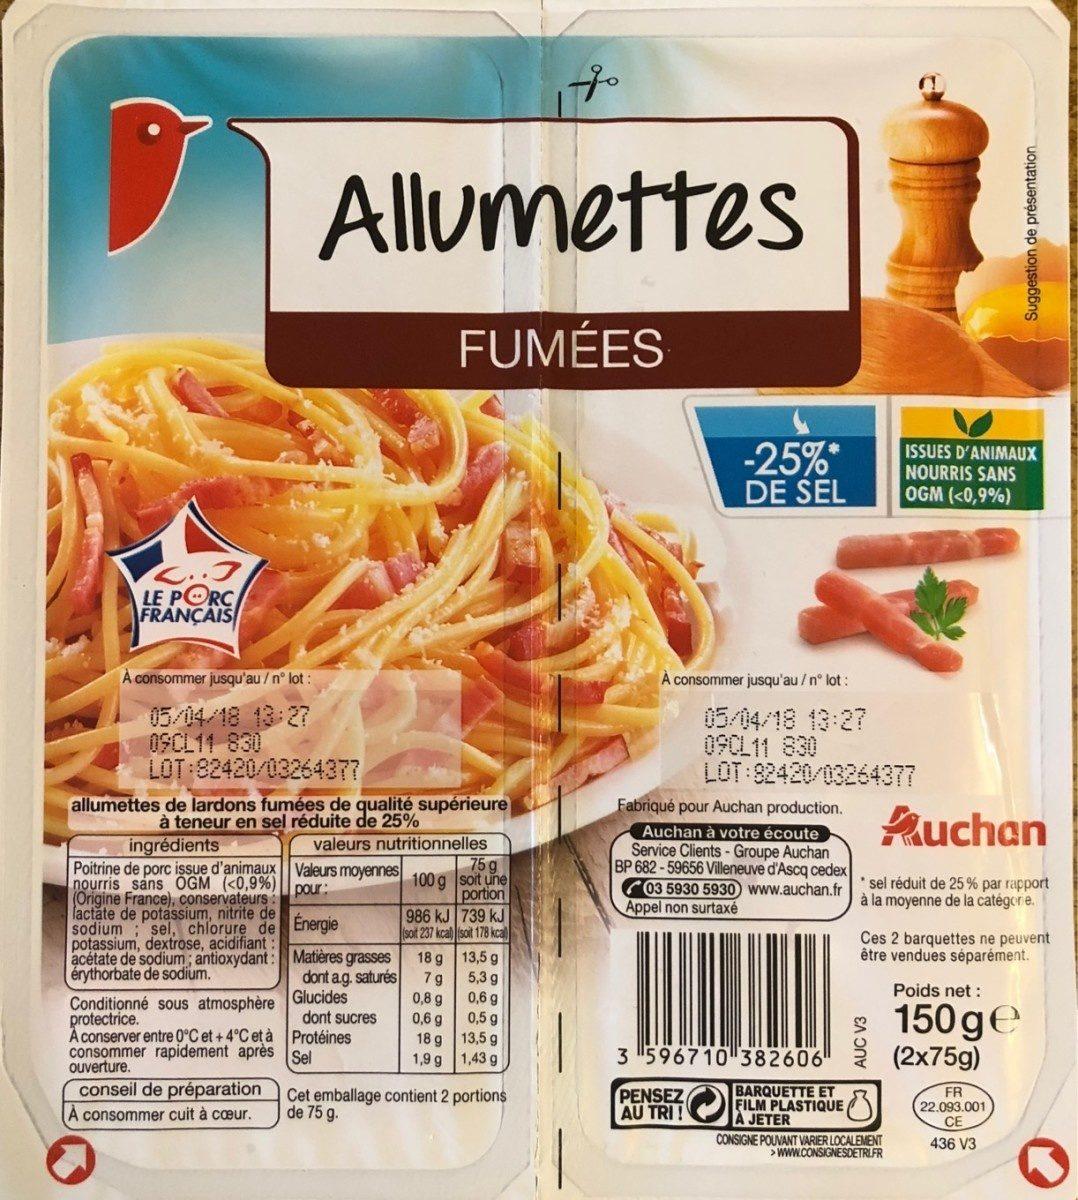 Allumettes Fumées (-25 % de sel) - Product - fr